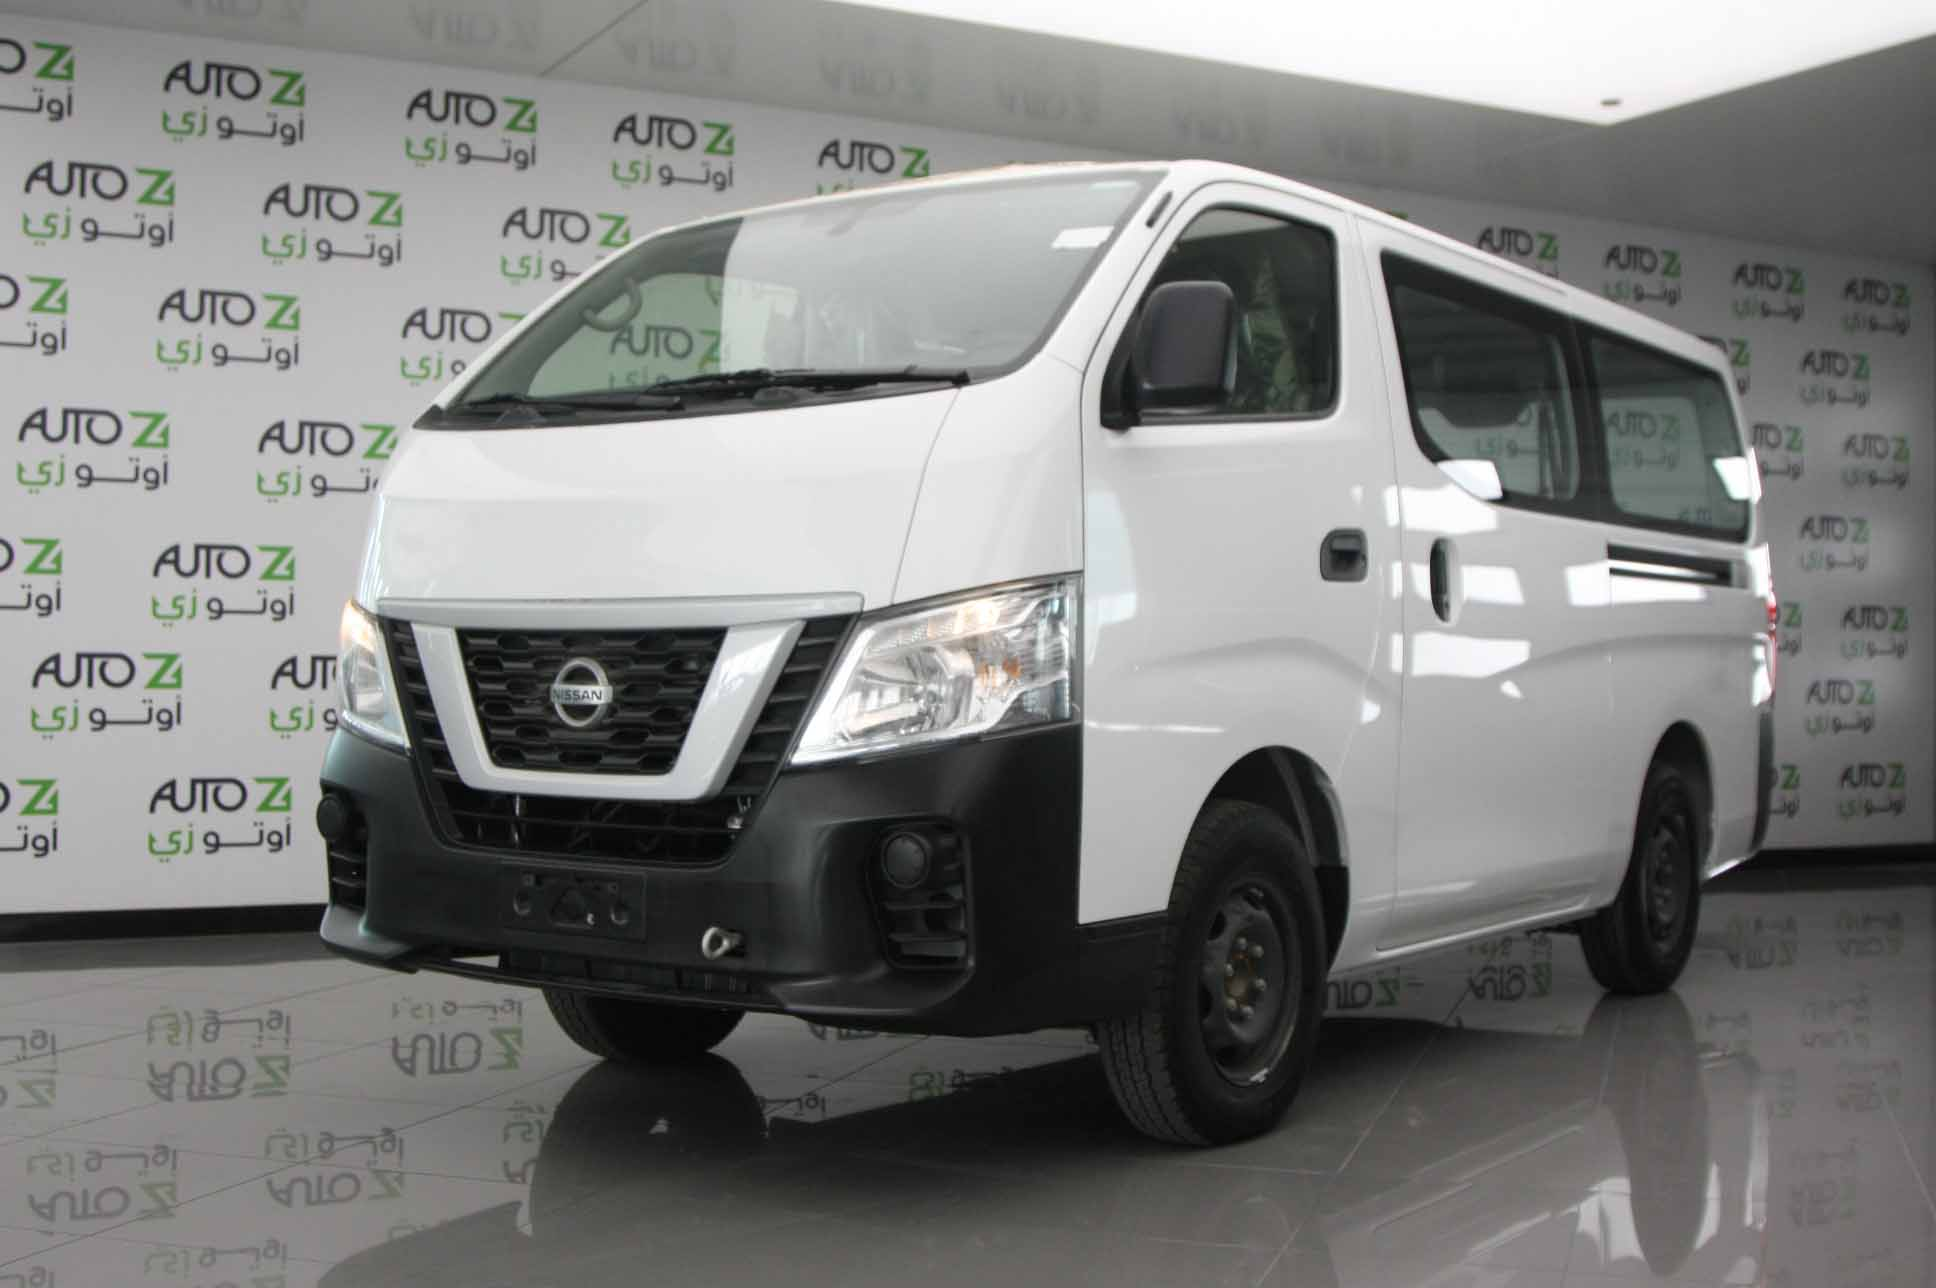 2018 Nissan Urvan Autoz Qatar